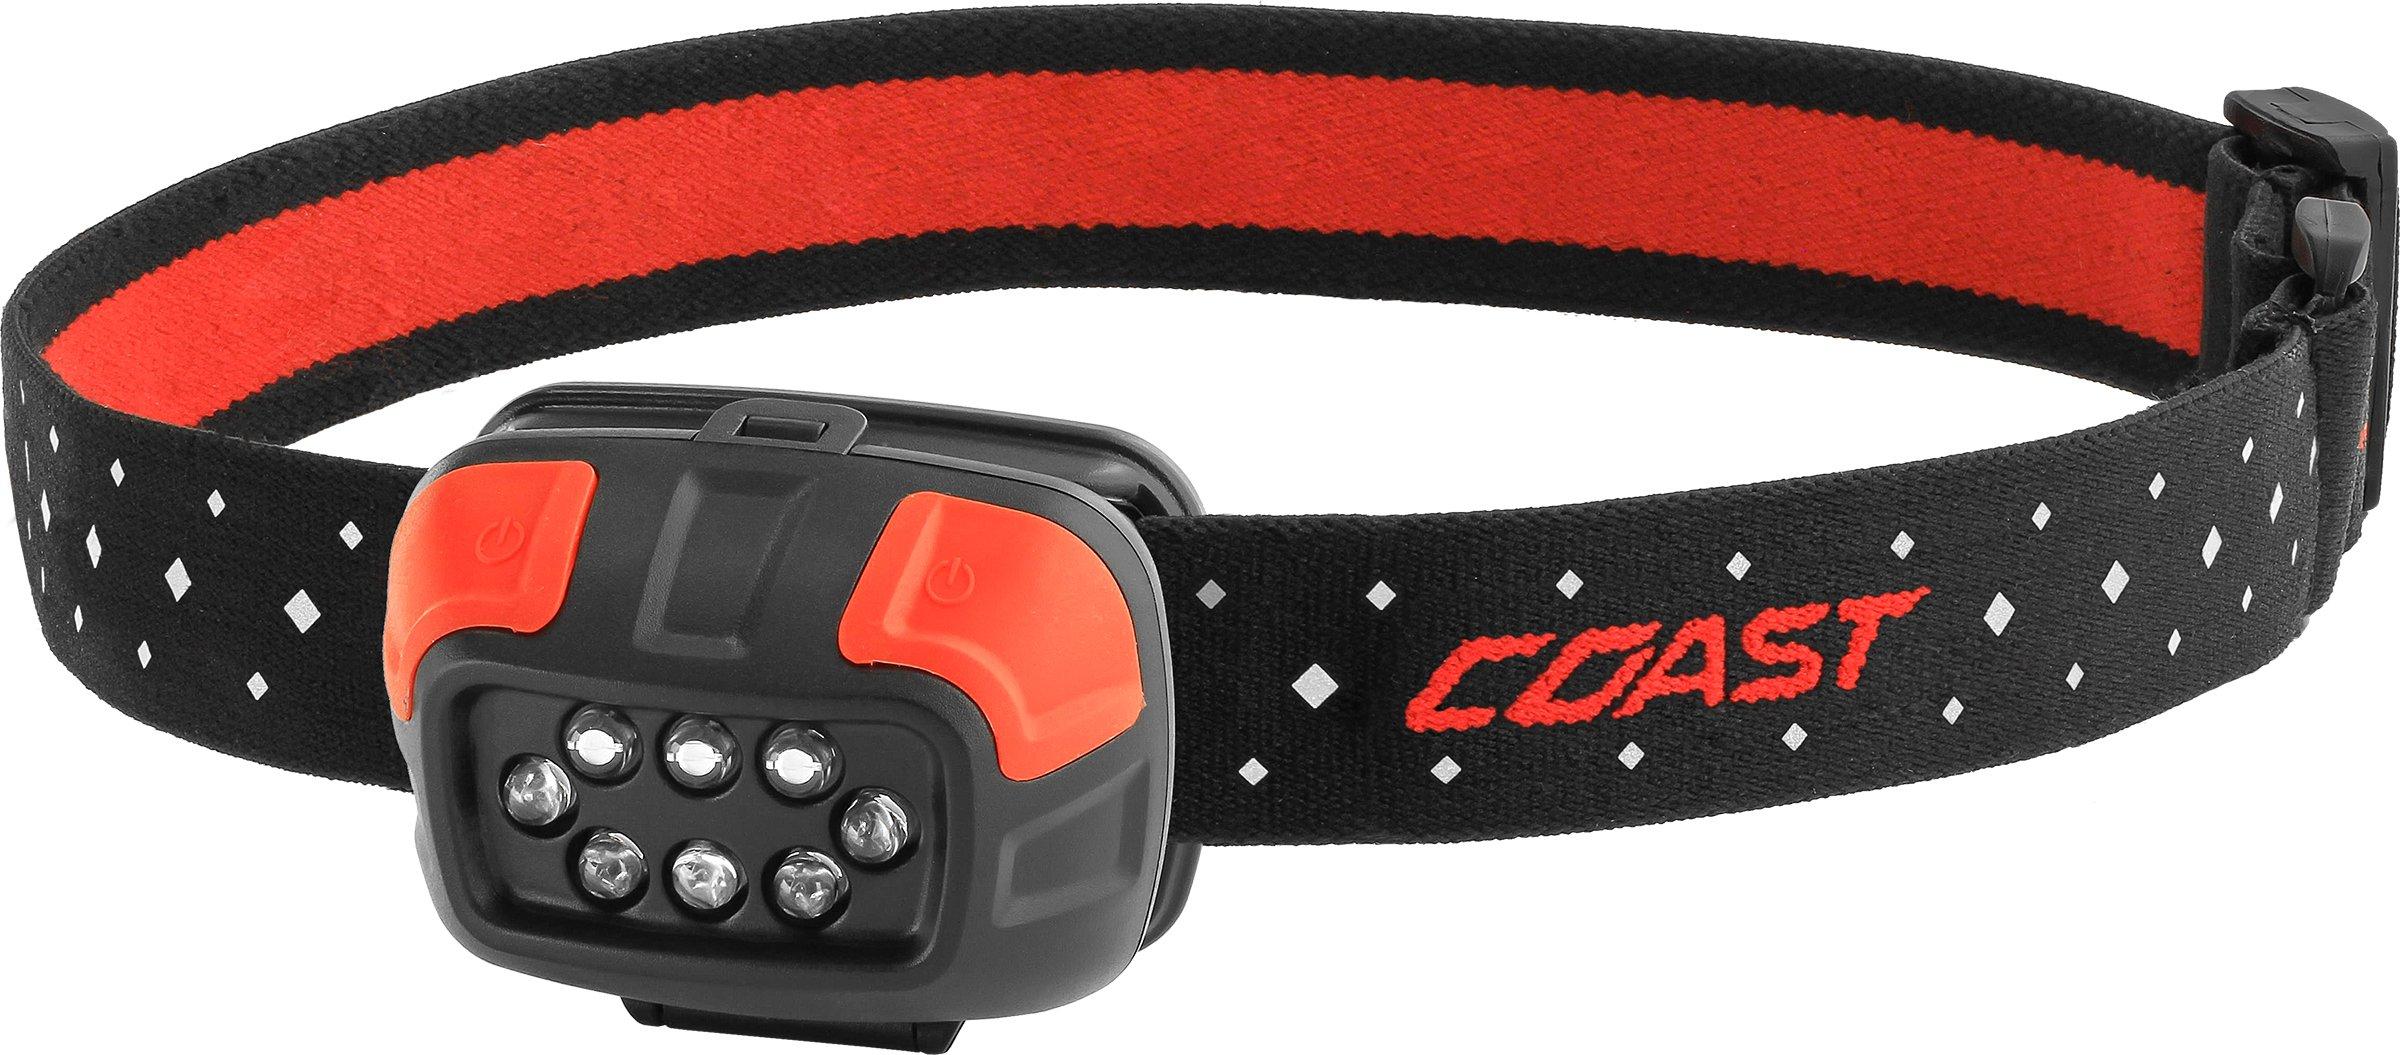 Coast FL44 250 lm Dual Color LED Headlamp by Coast